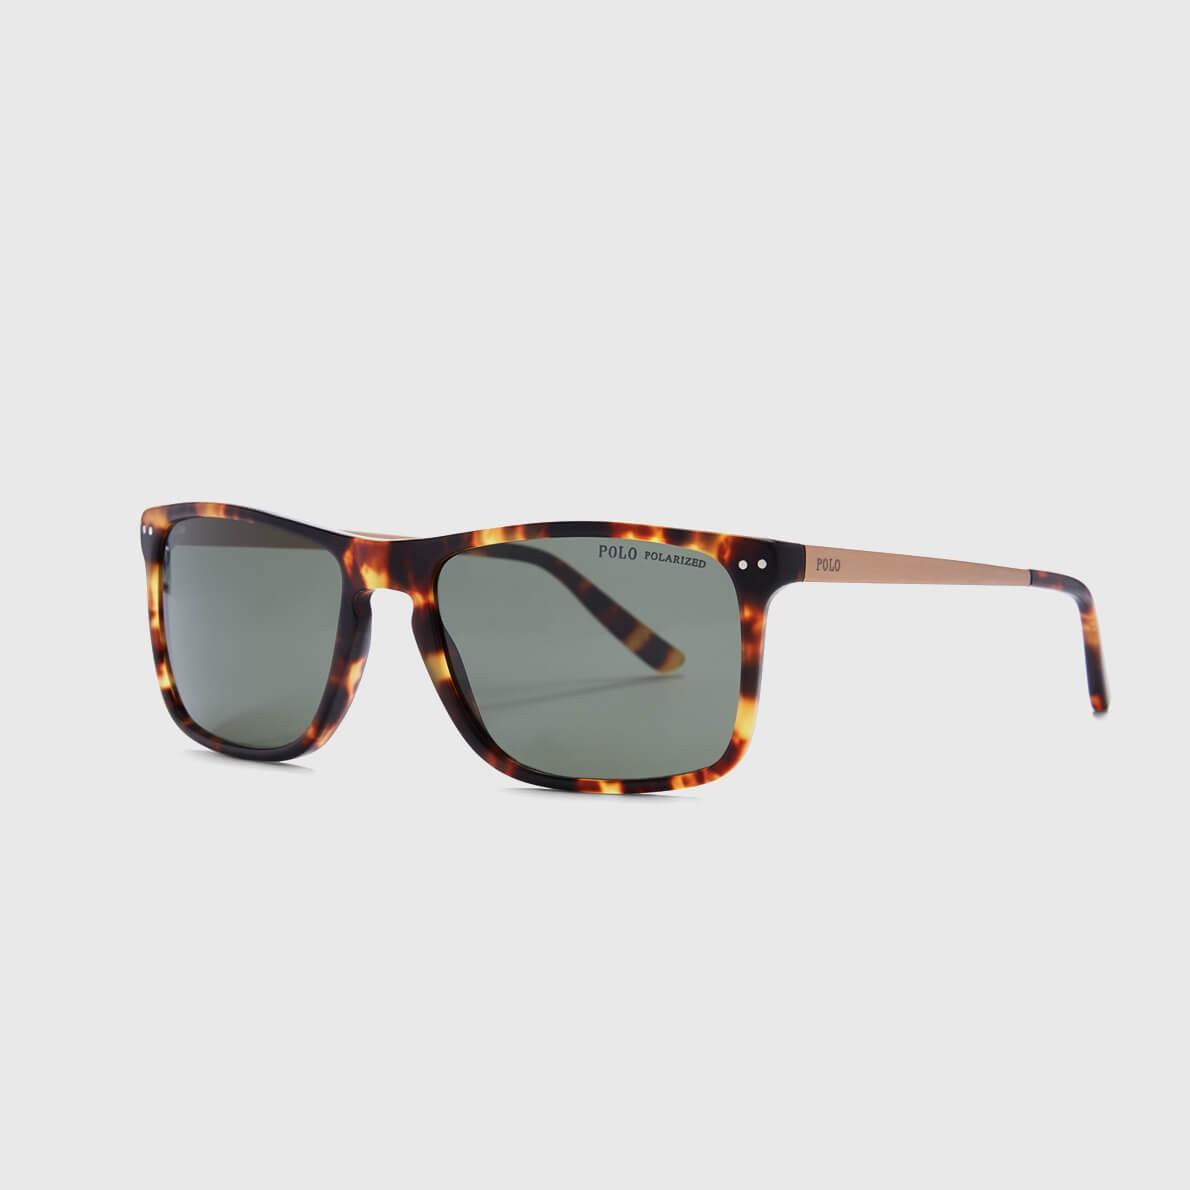 Metal Temple Sunglasses